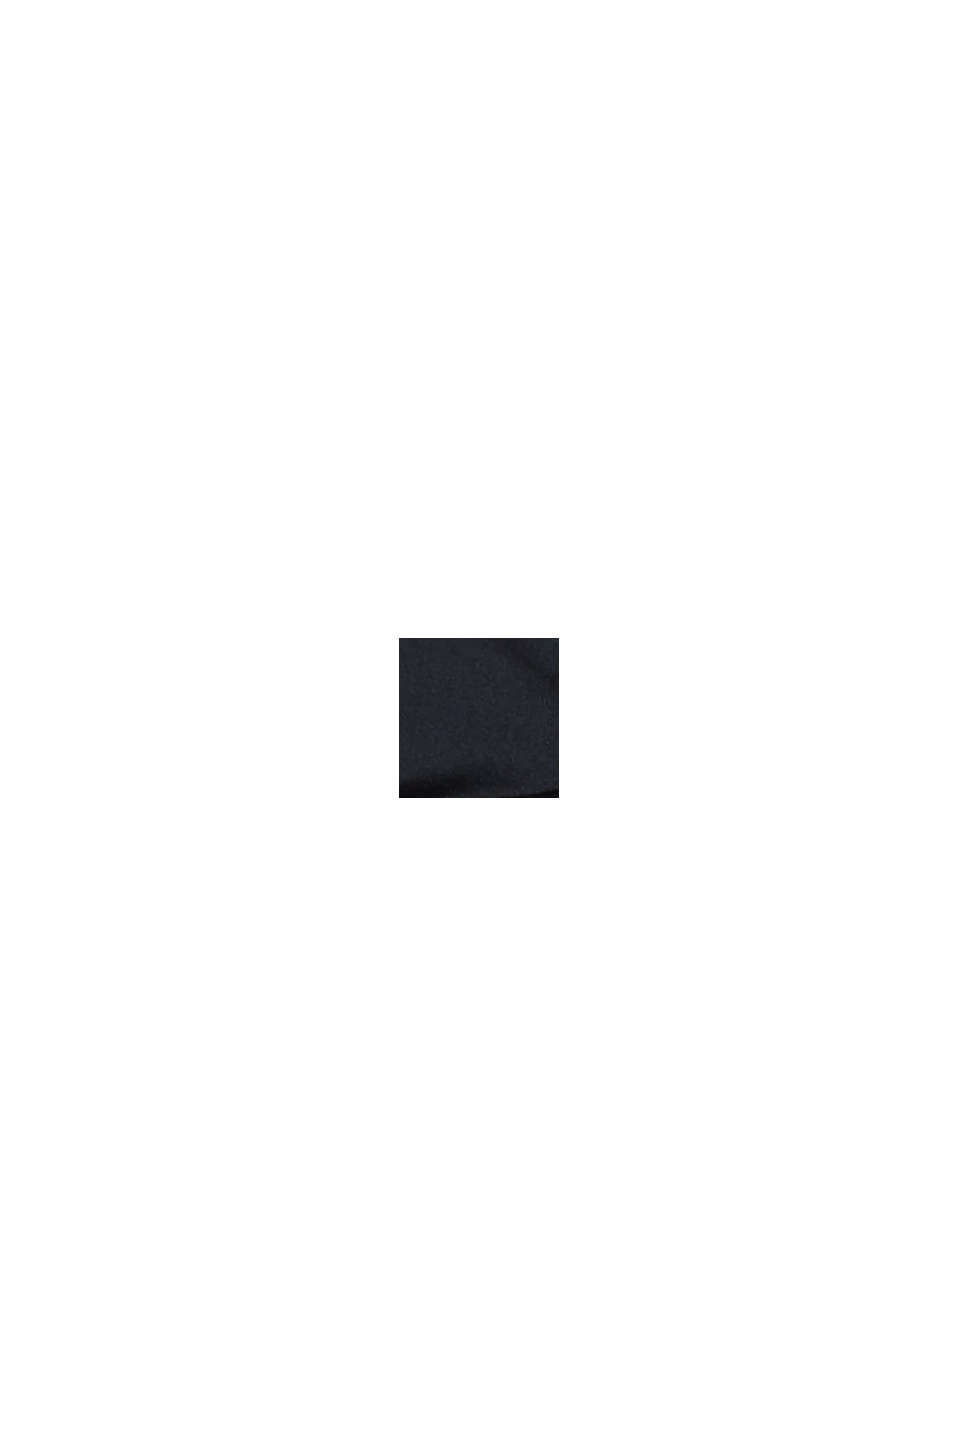 kalsonger i mikrofiber, 3-pack, BLACK, swatch